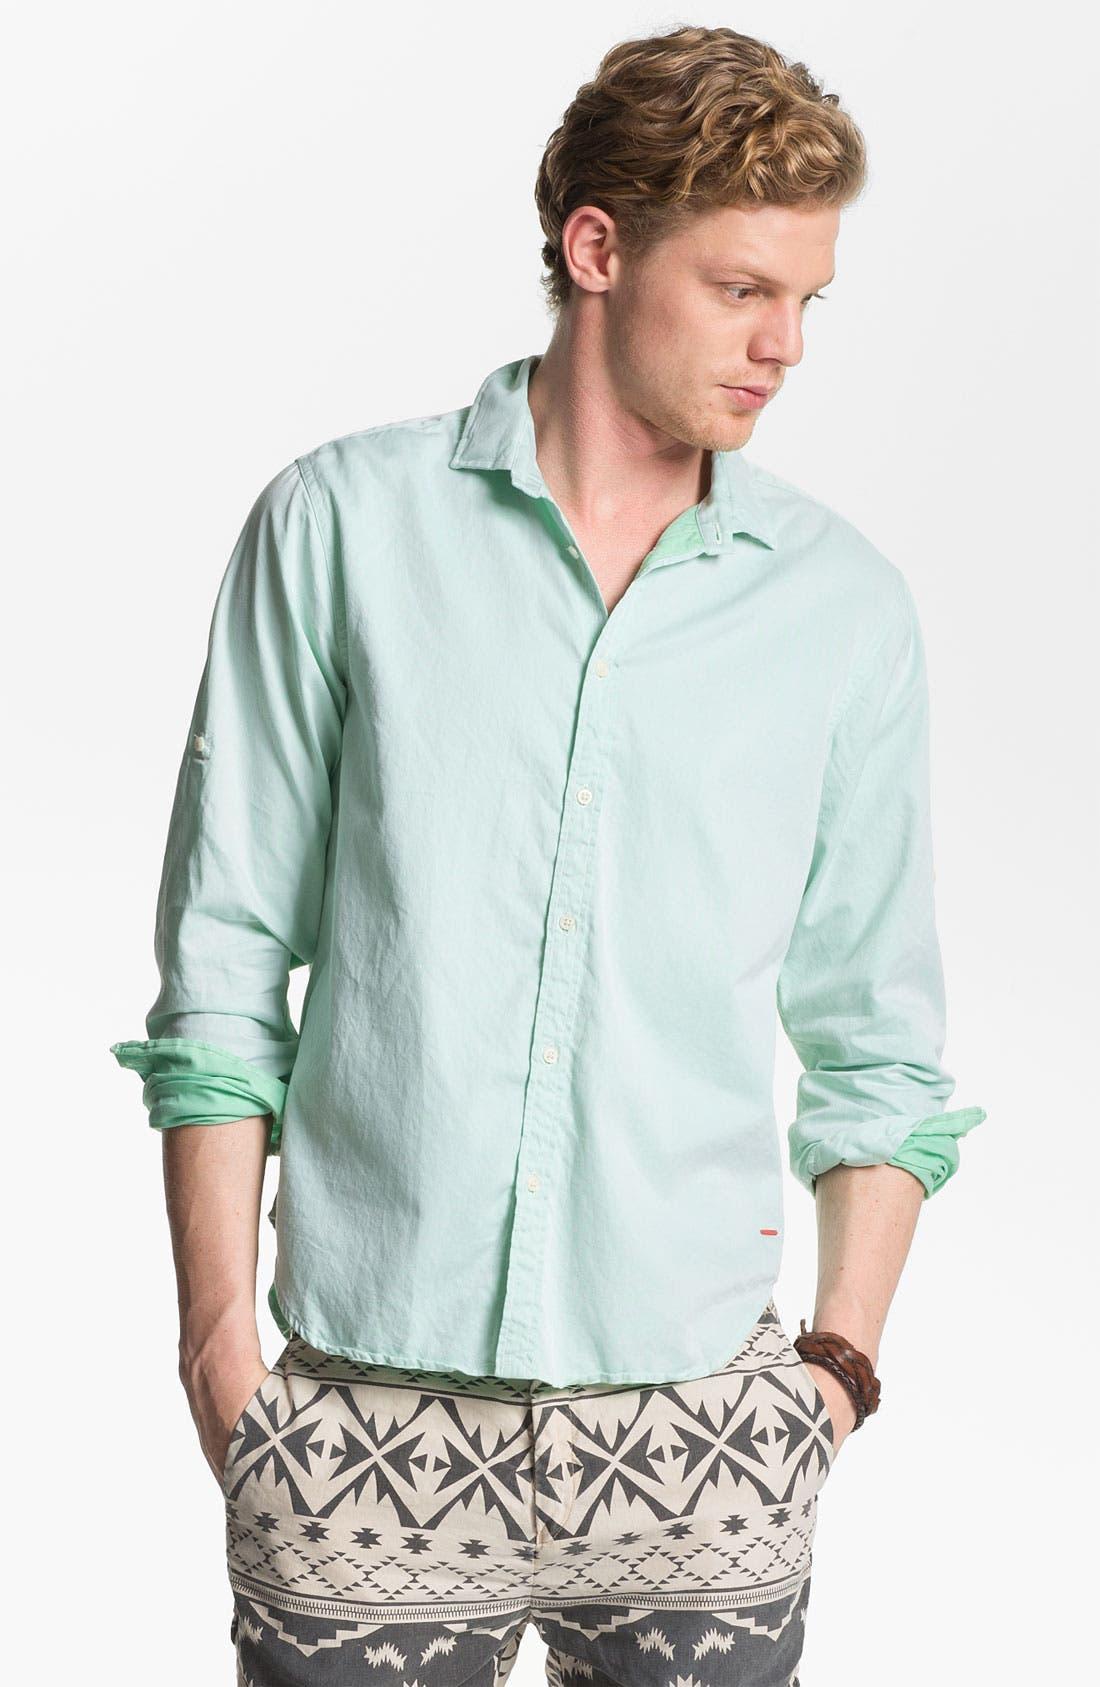 Alternate Image 1 Selected - Scotch & Soda Cotton Poplin Sport Shirt